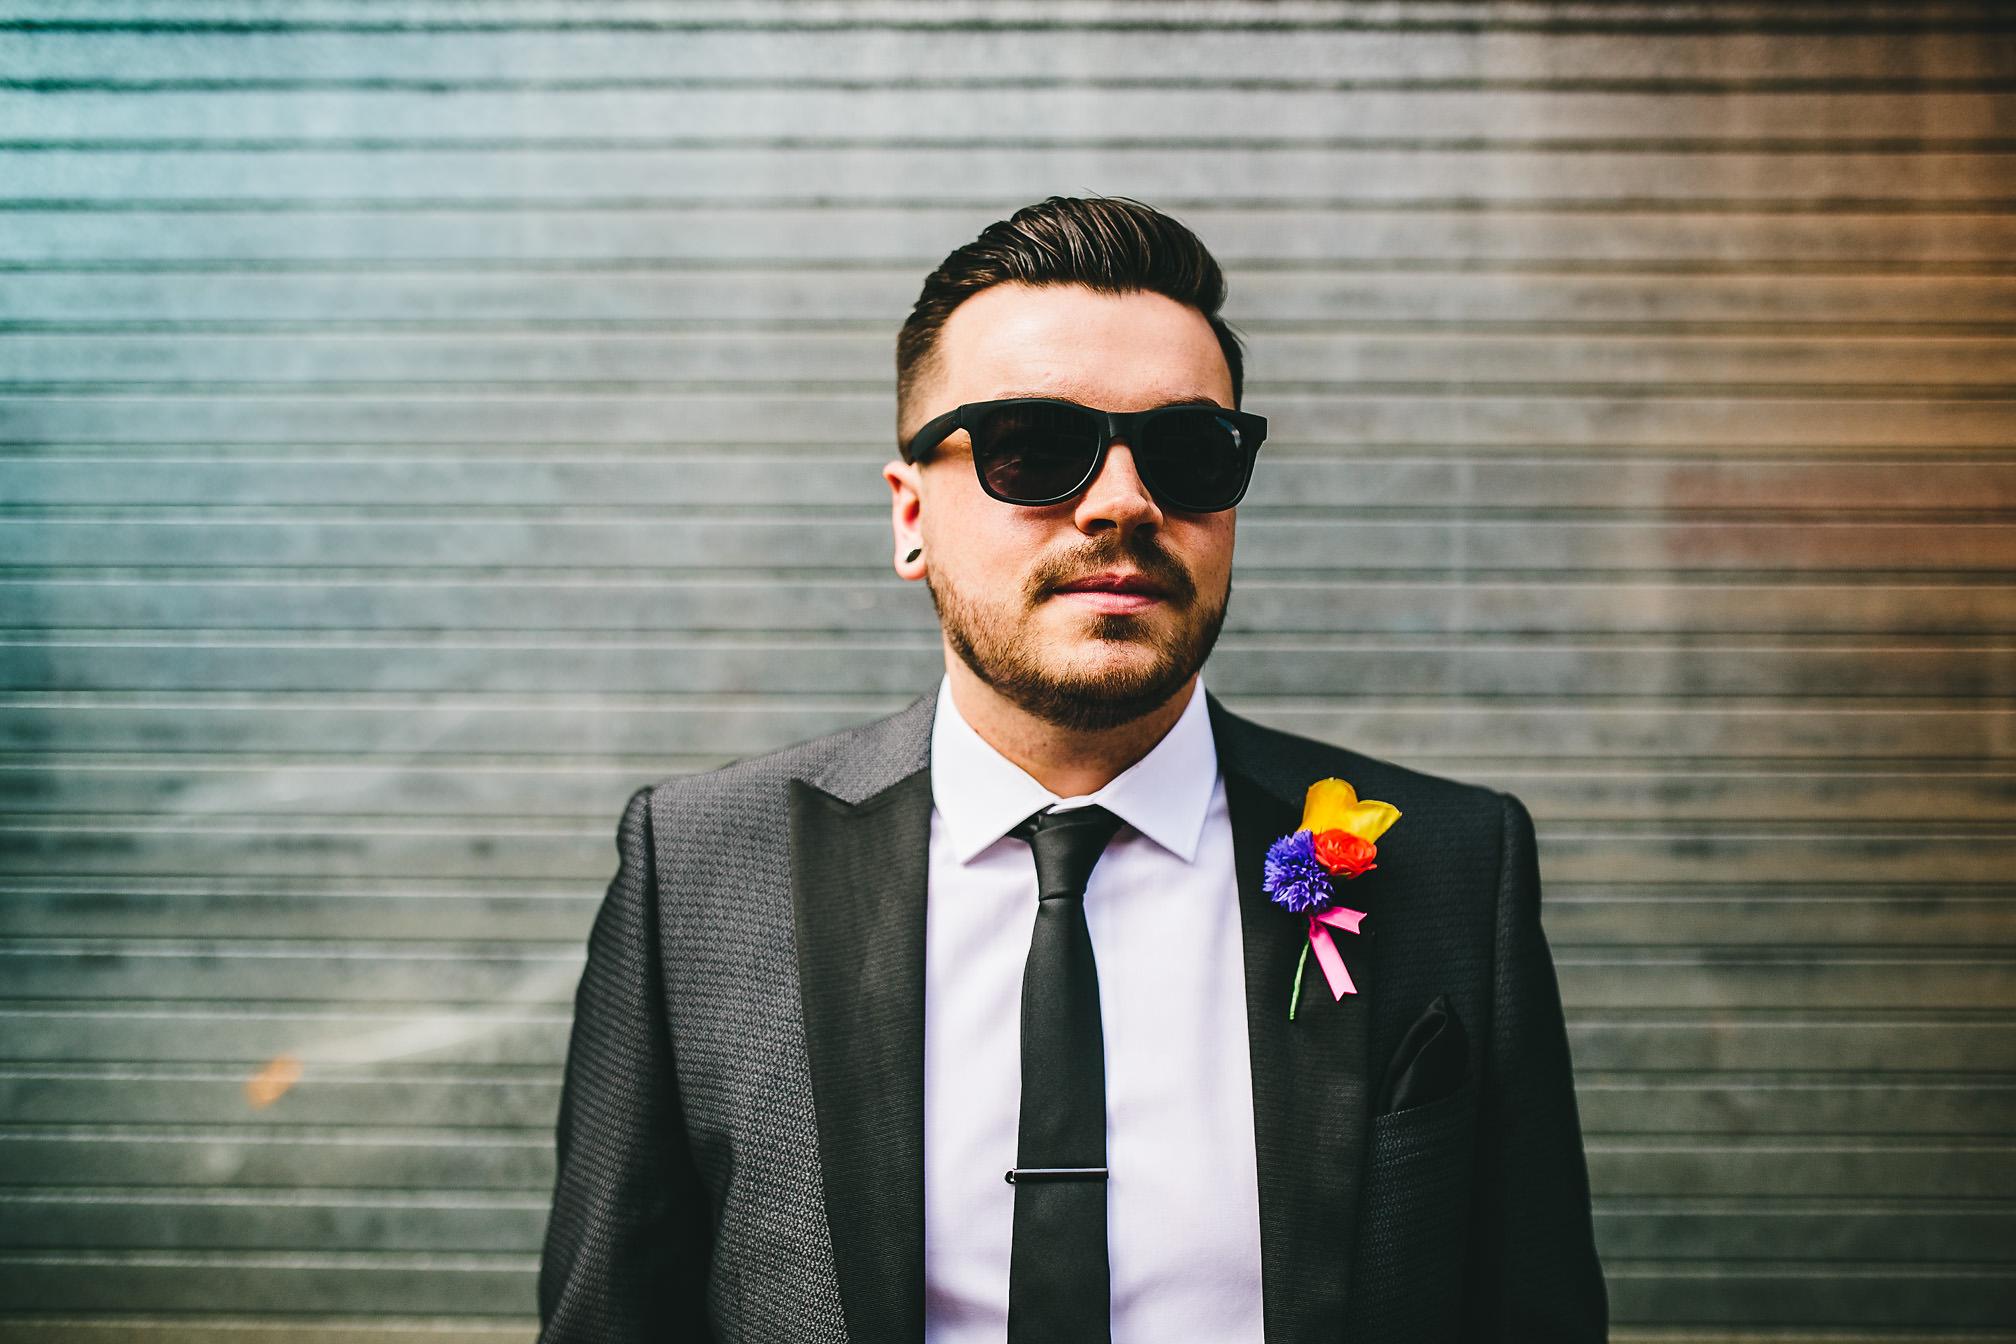 Cool grooms portrait